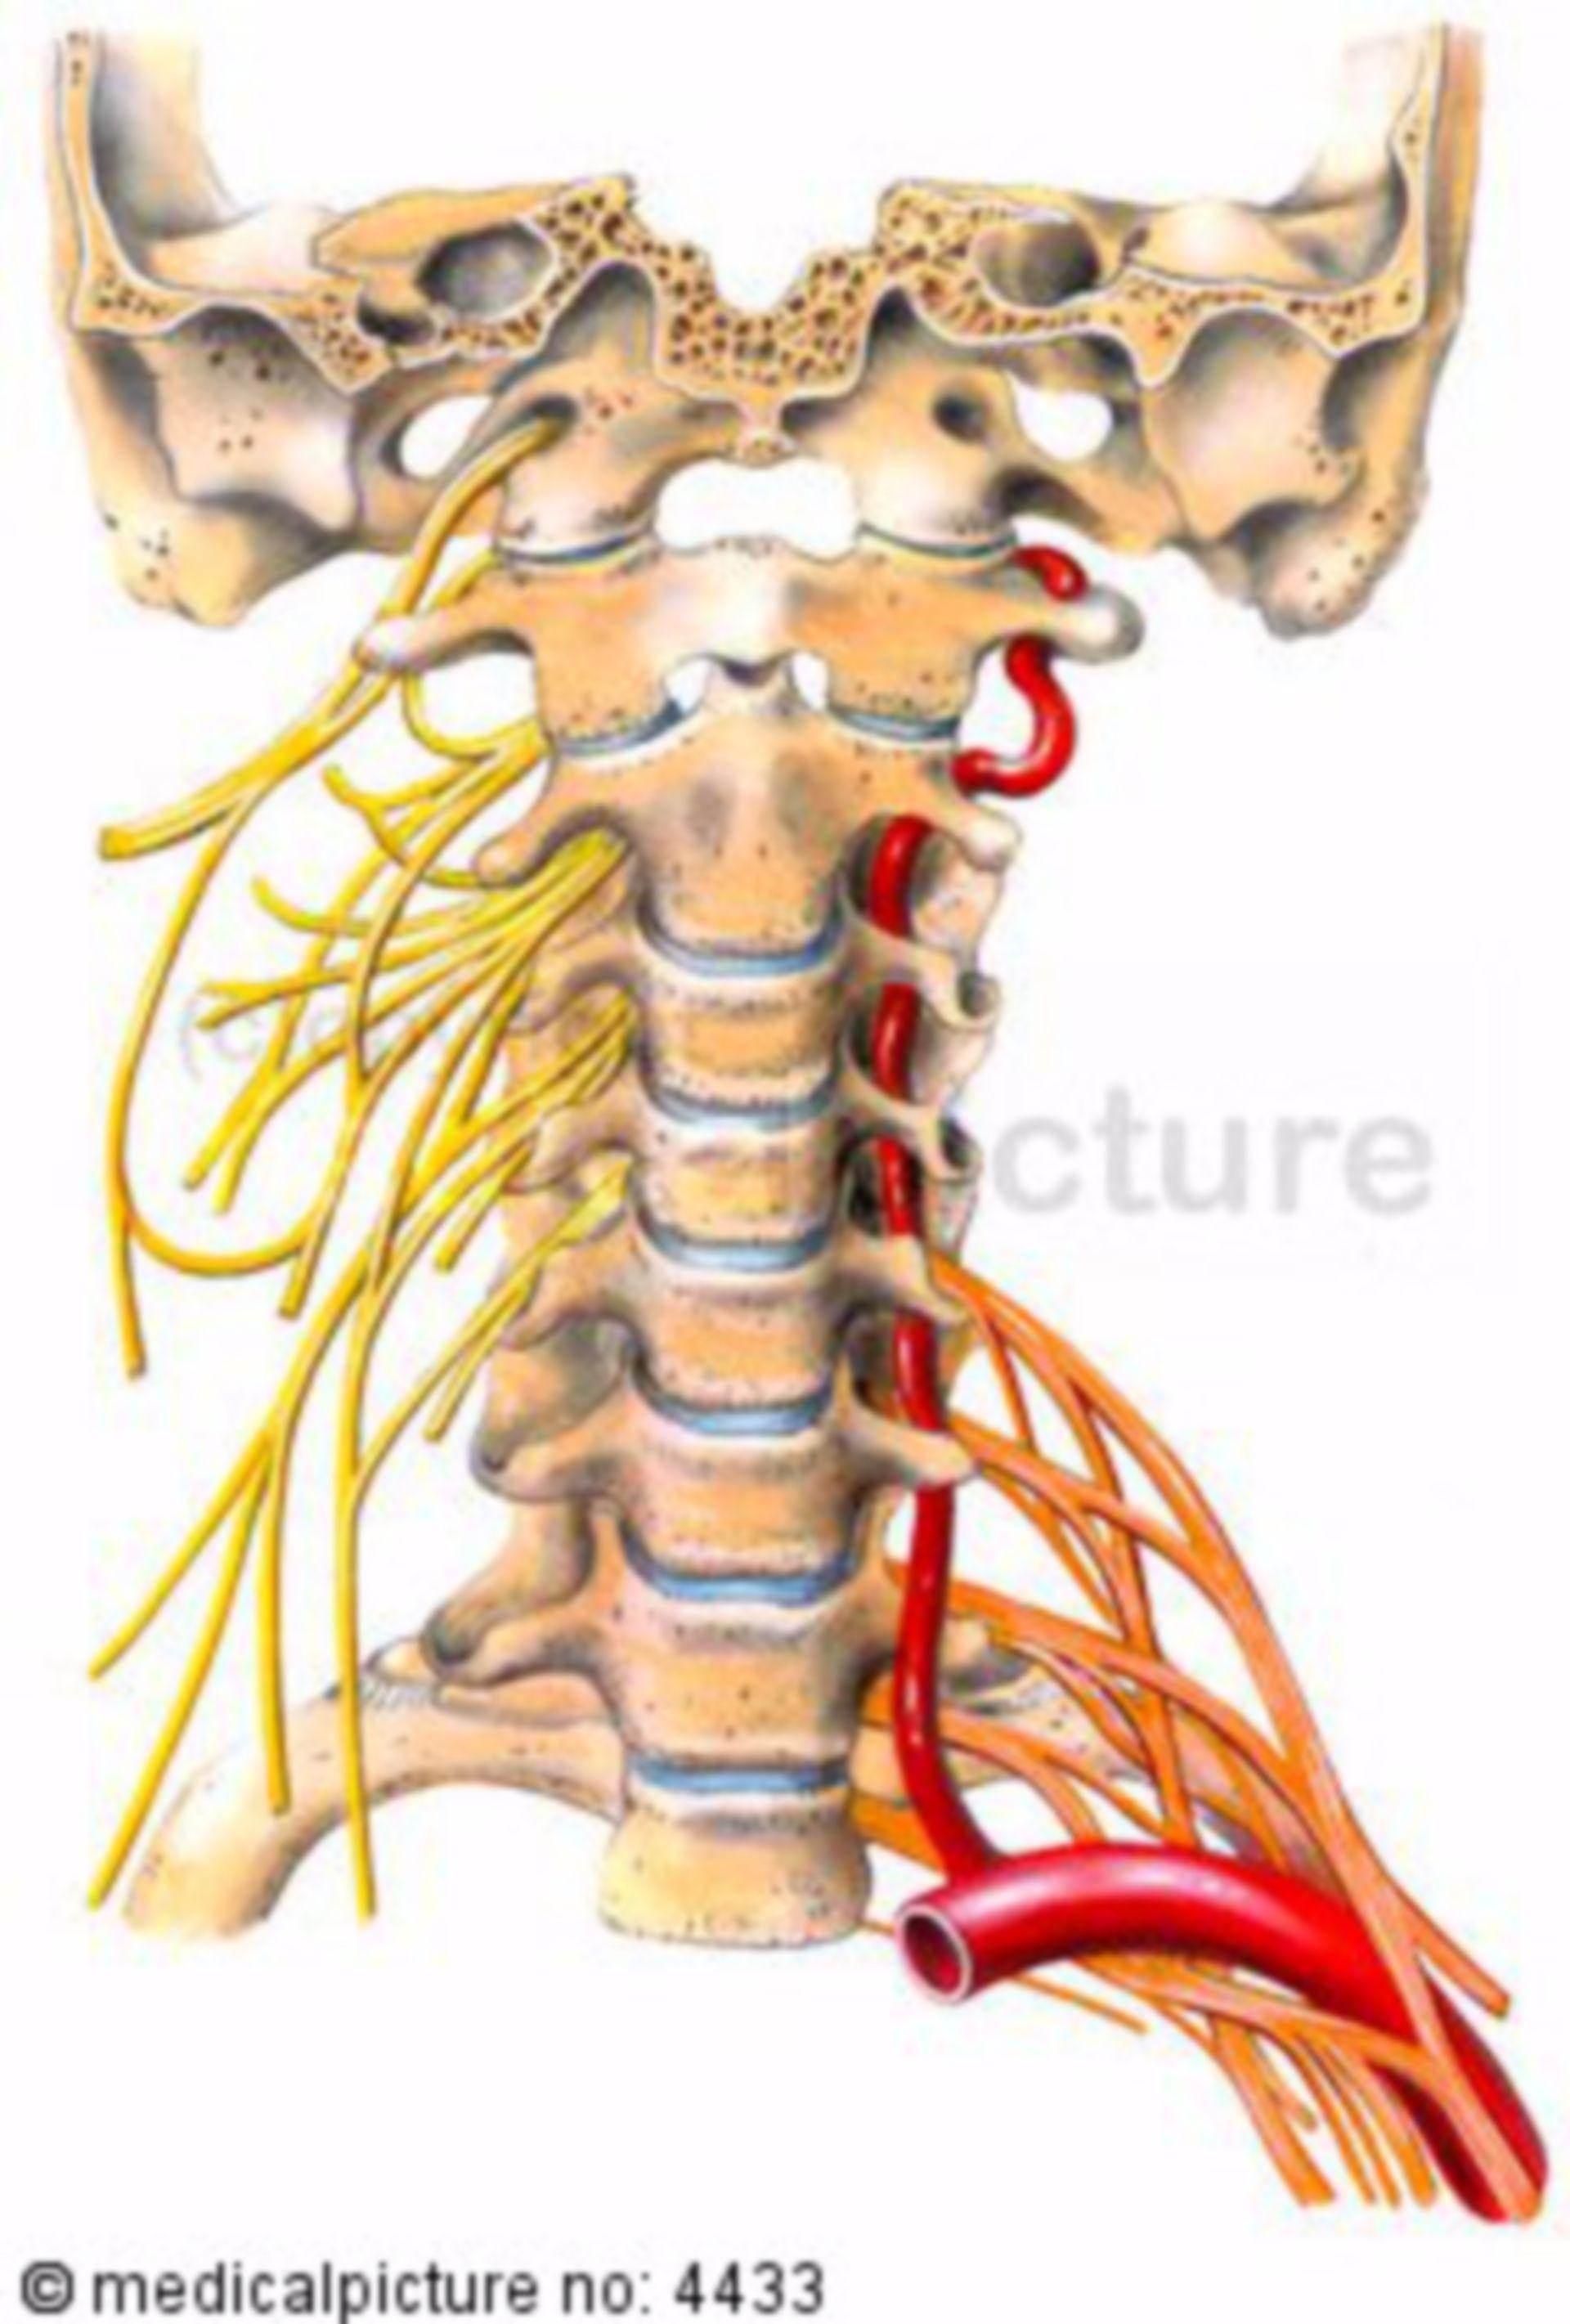 Columna cervical con plexo nervioso